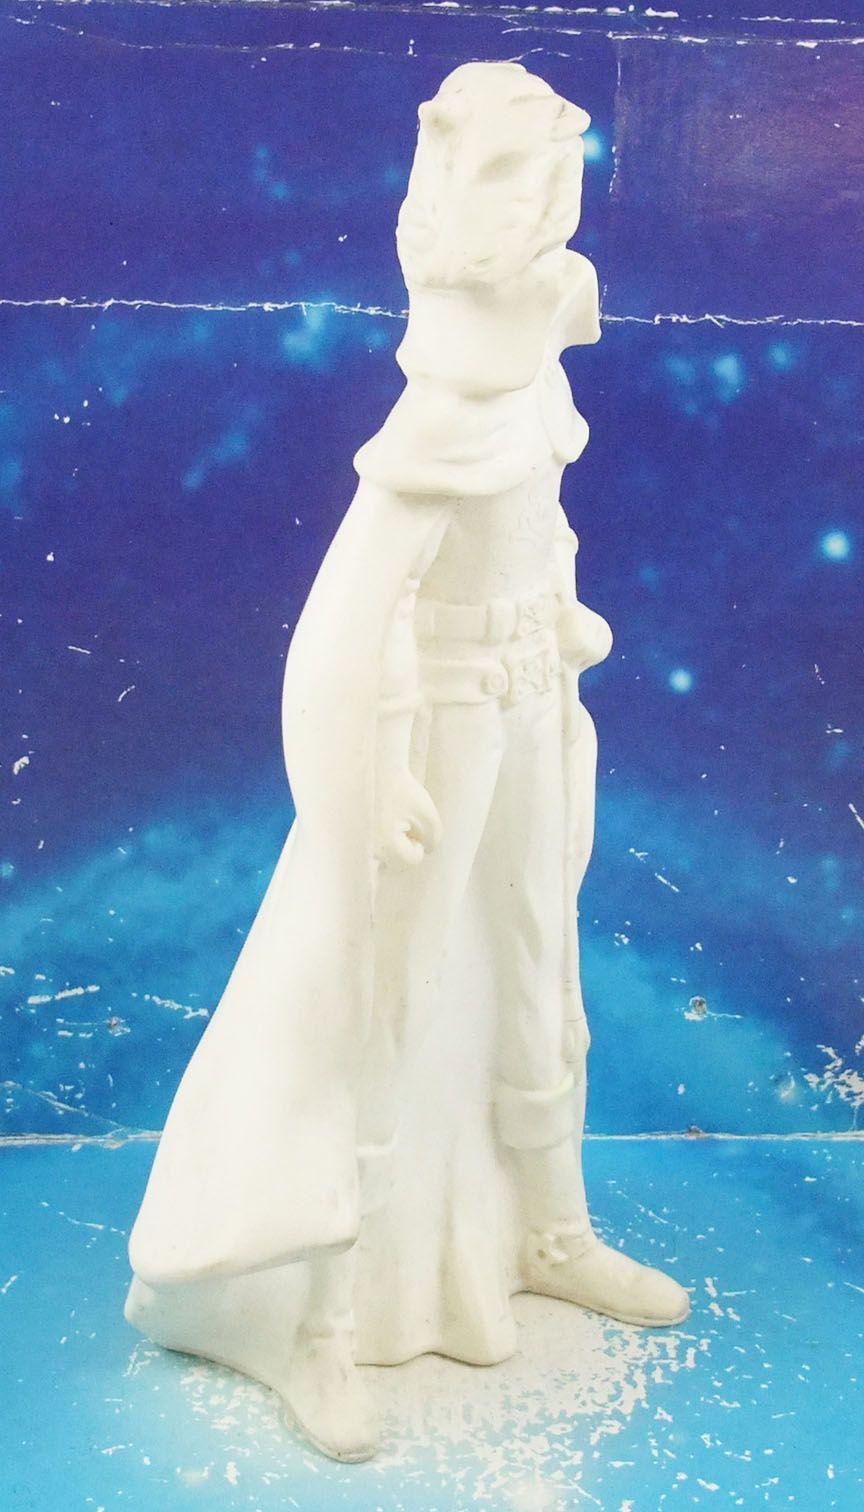 "Captain Harlock - 9\"" Squeeze toy unpainted white - Delacoste"